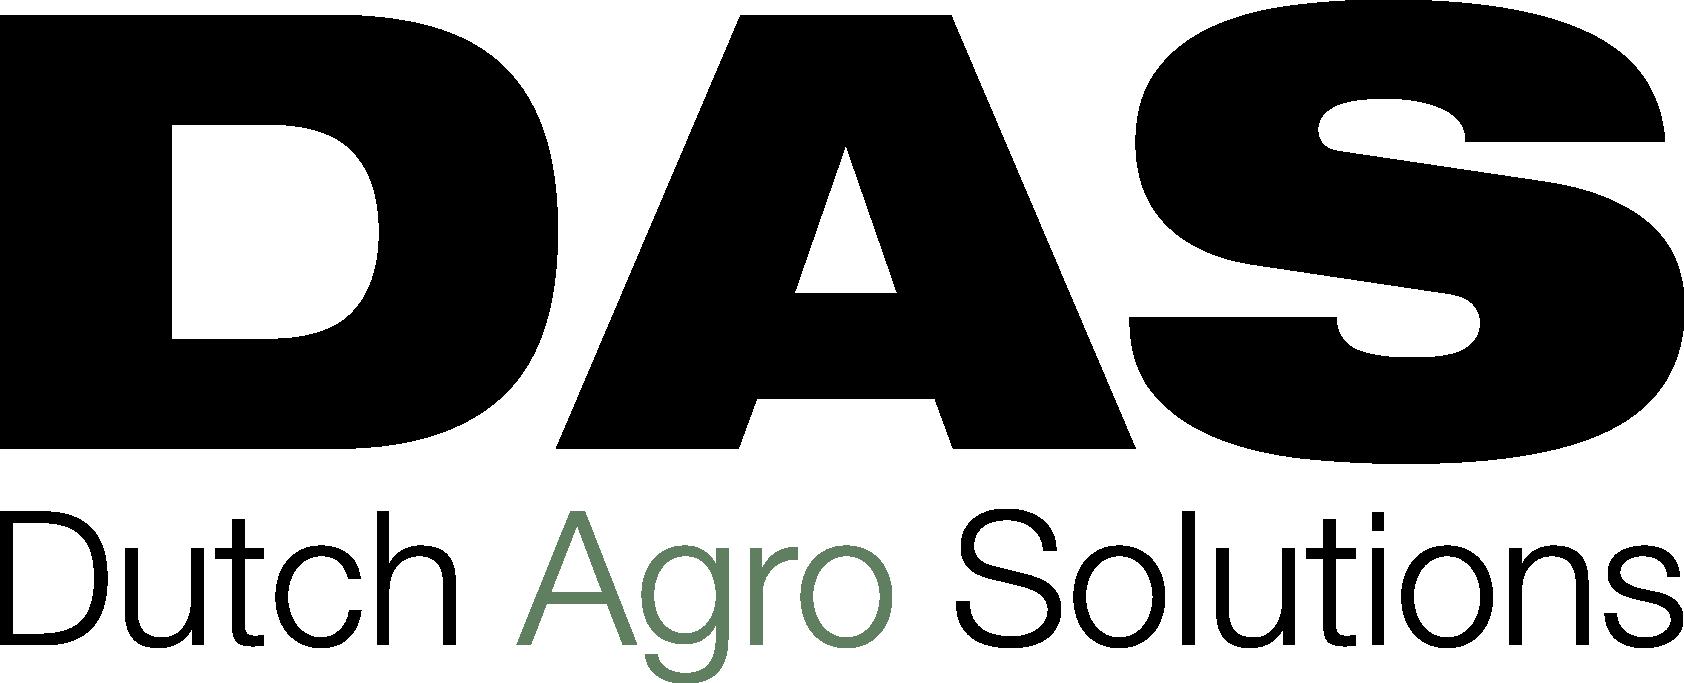 Dutch Agro Solutions